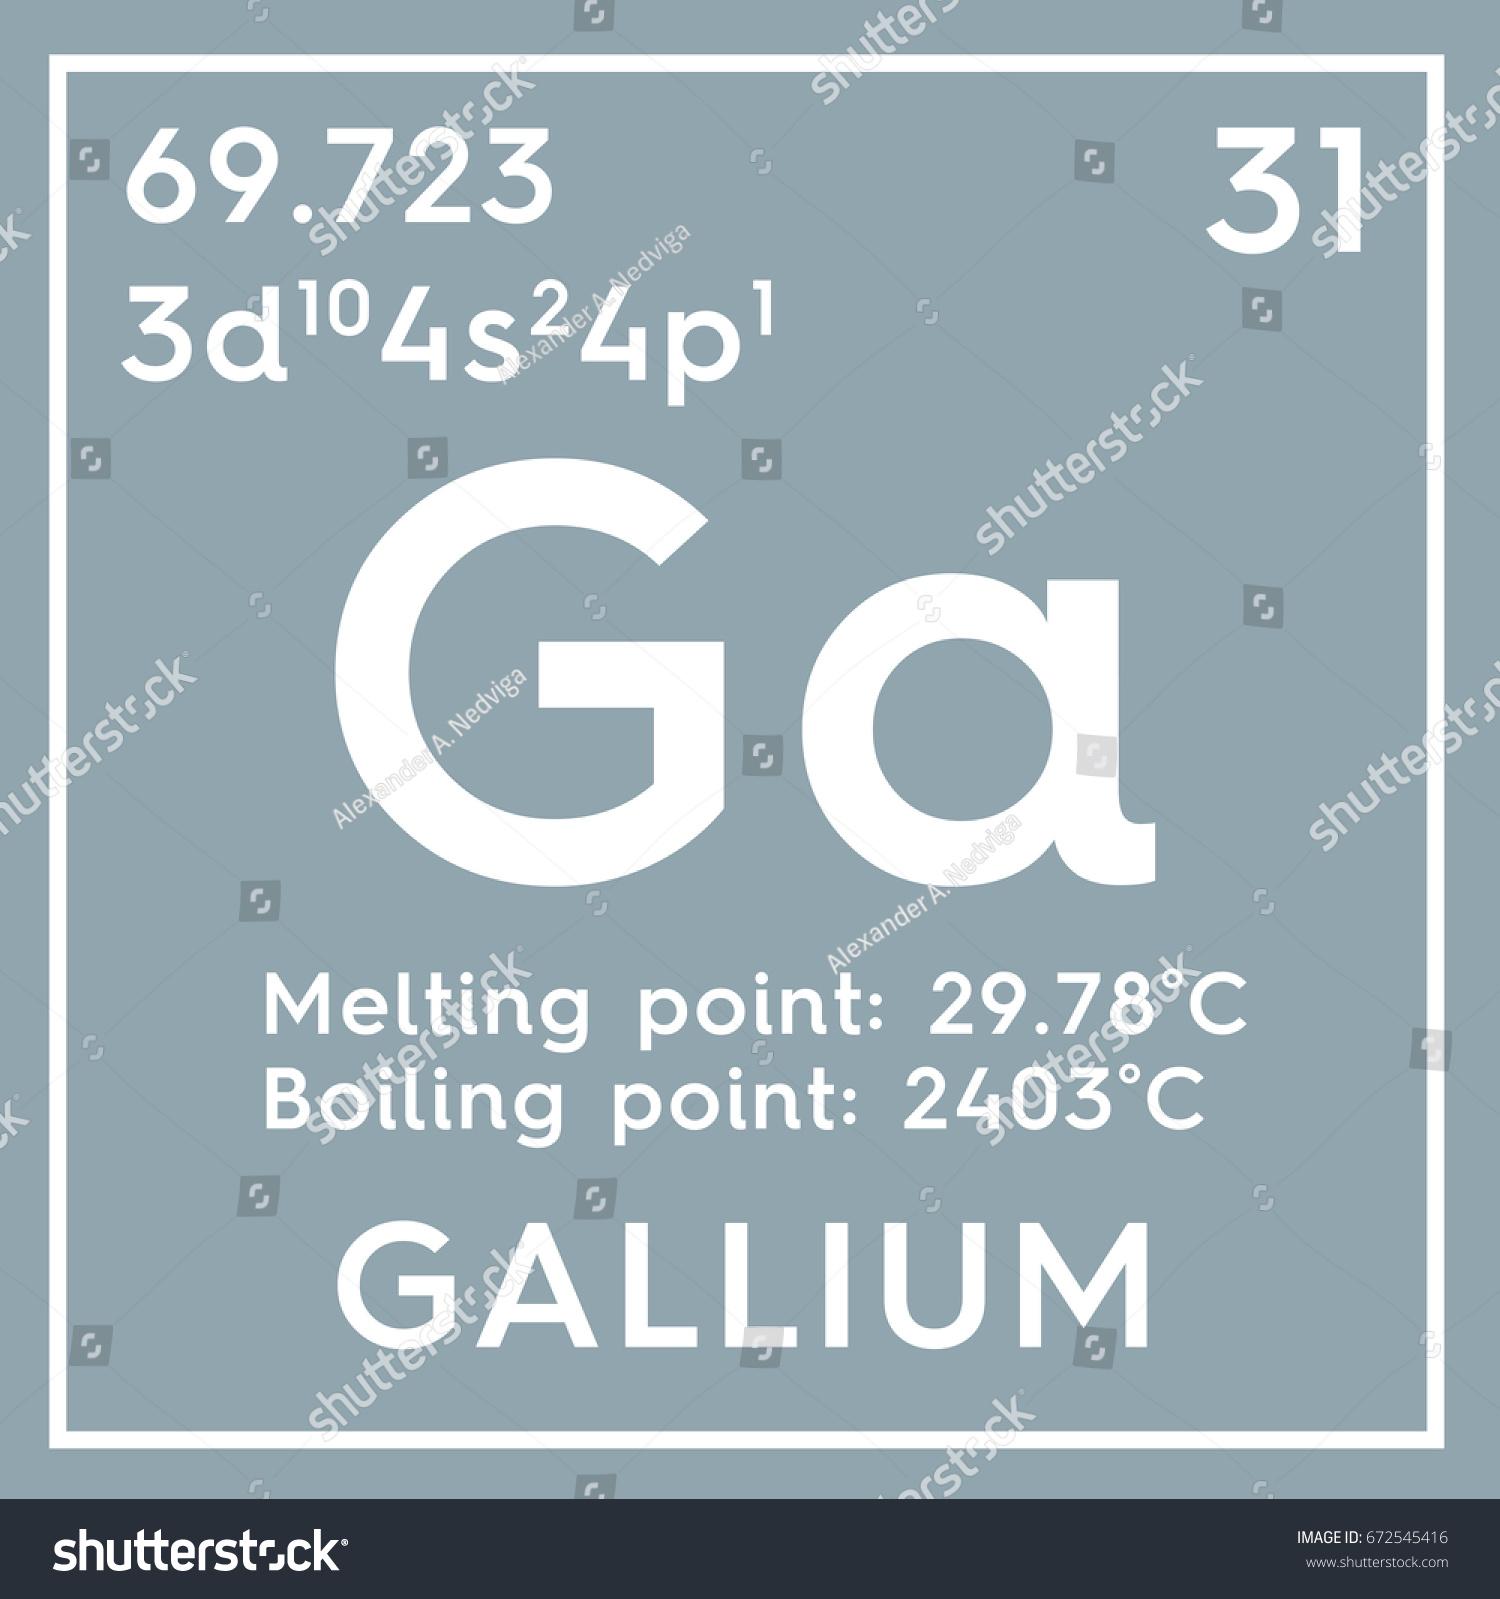 Gallium posttransition metals chemical element mendeleevs stock chemical element of mendeleevs periodic table gallium in gamestrikefo Gallery